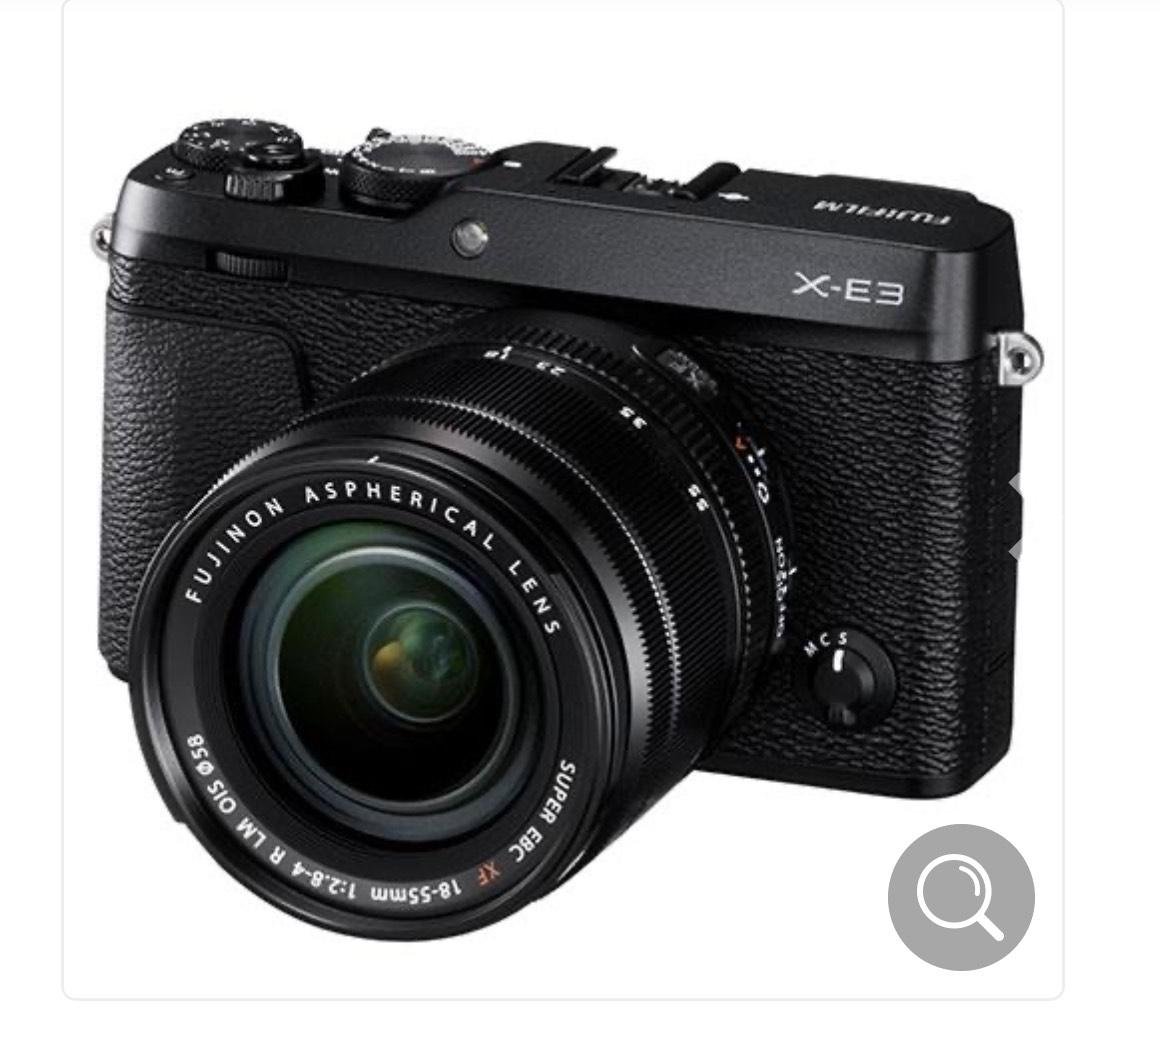 Fujifilm X-E3 with 18-55mm f2.8 lens - £548.97 @ Jessops